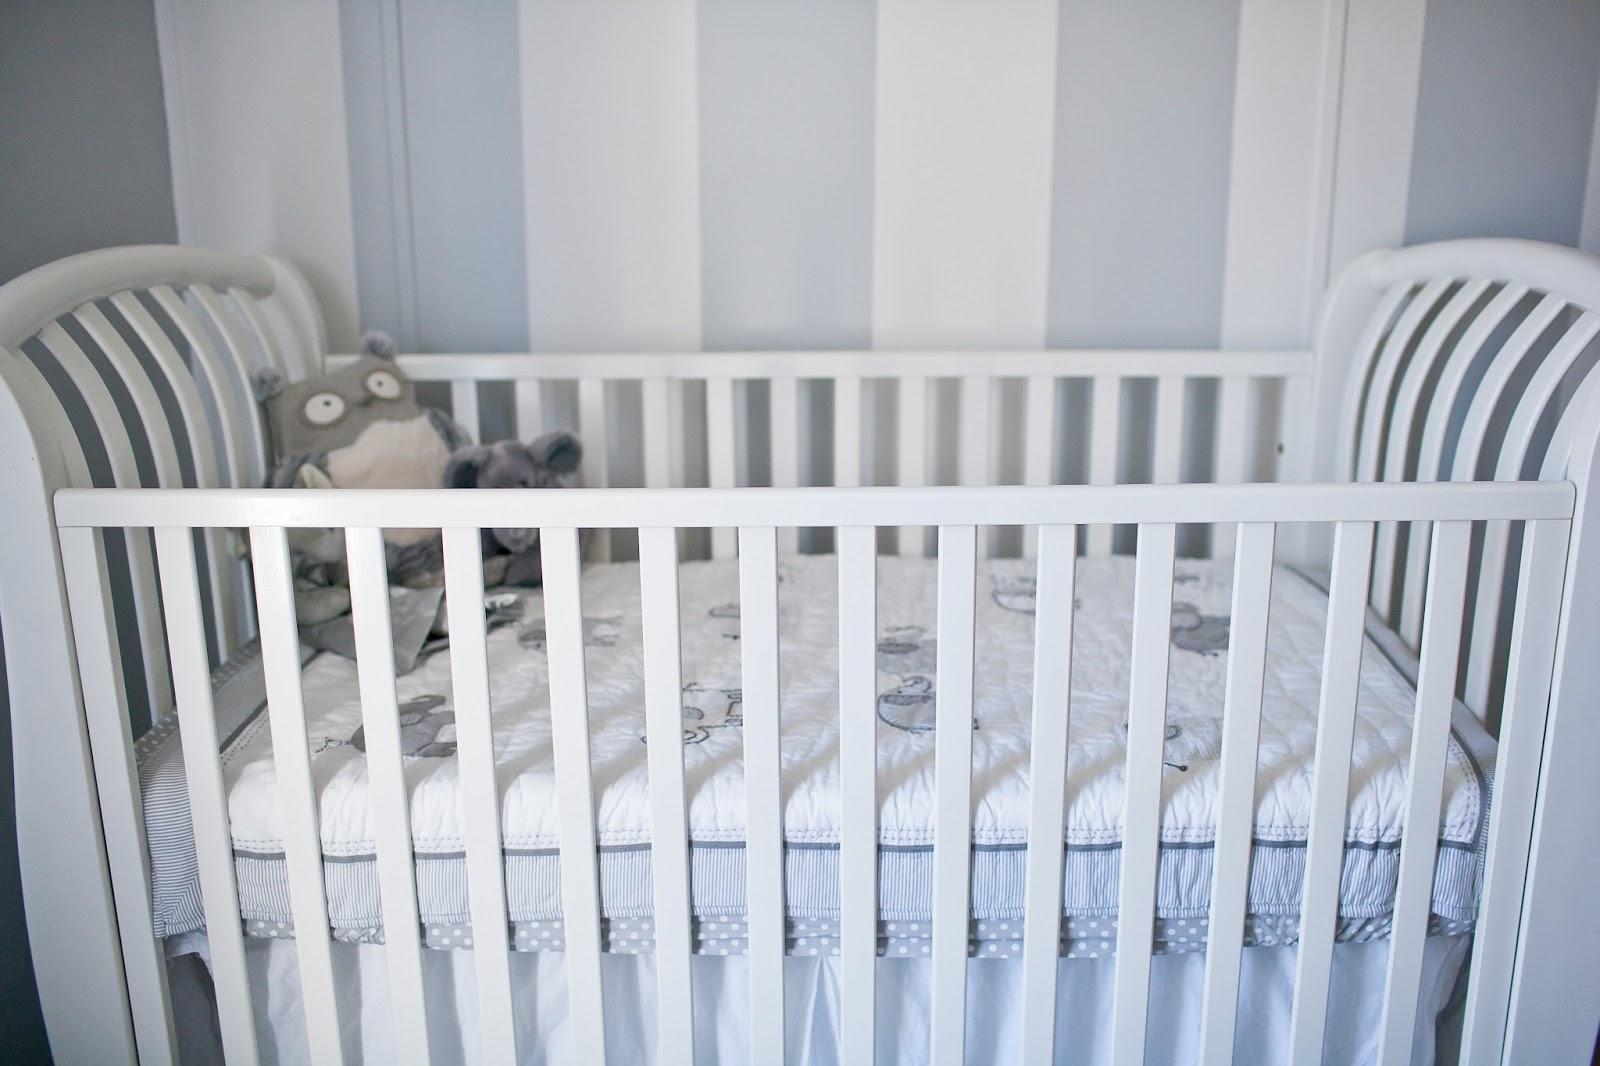 bound by symmetry.: Henry - Sleeping Beauty Nursery Theme's nursery